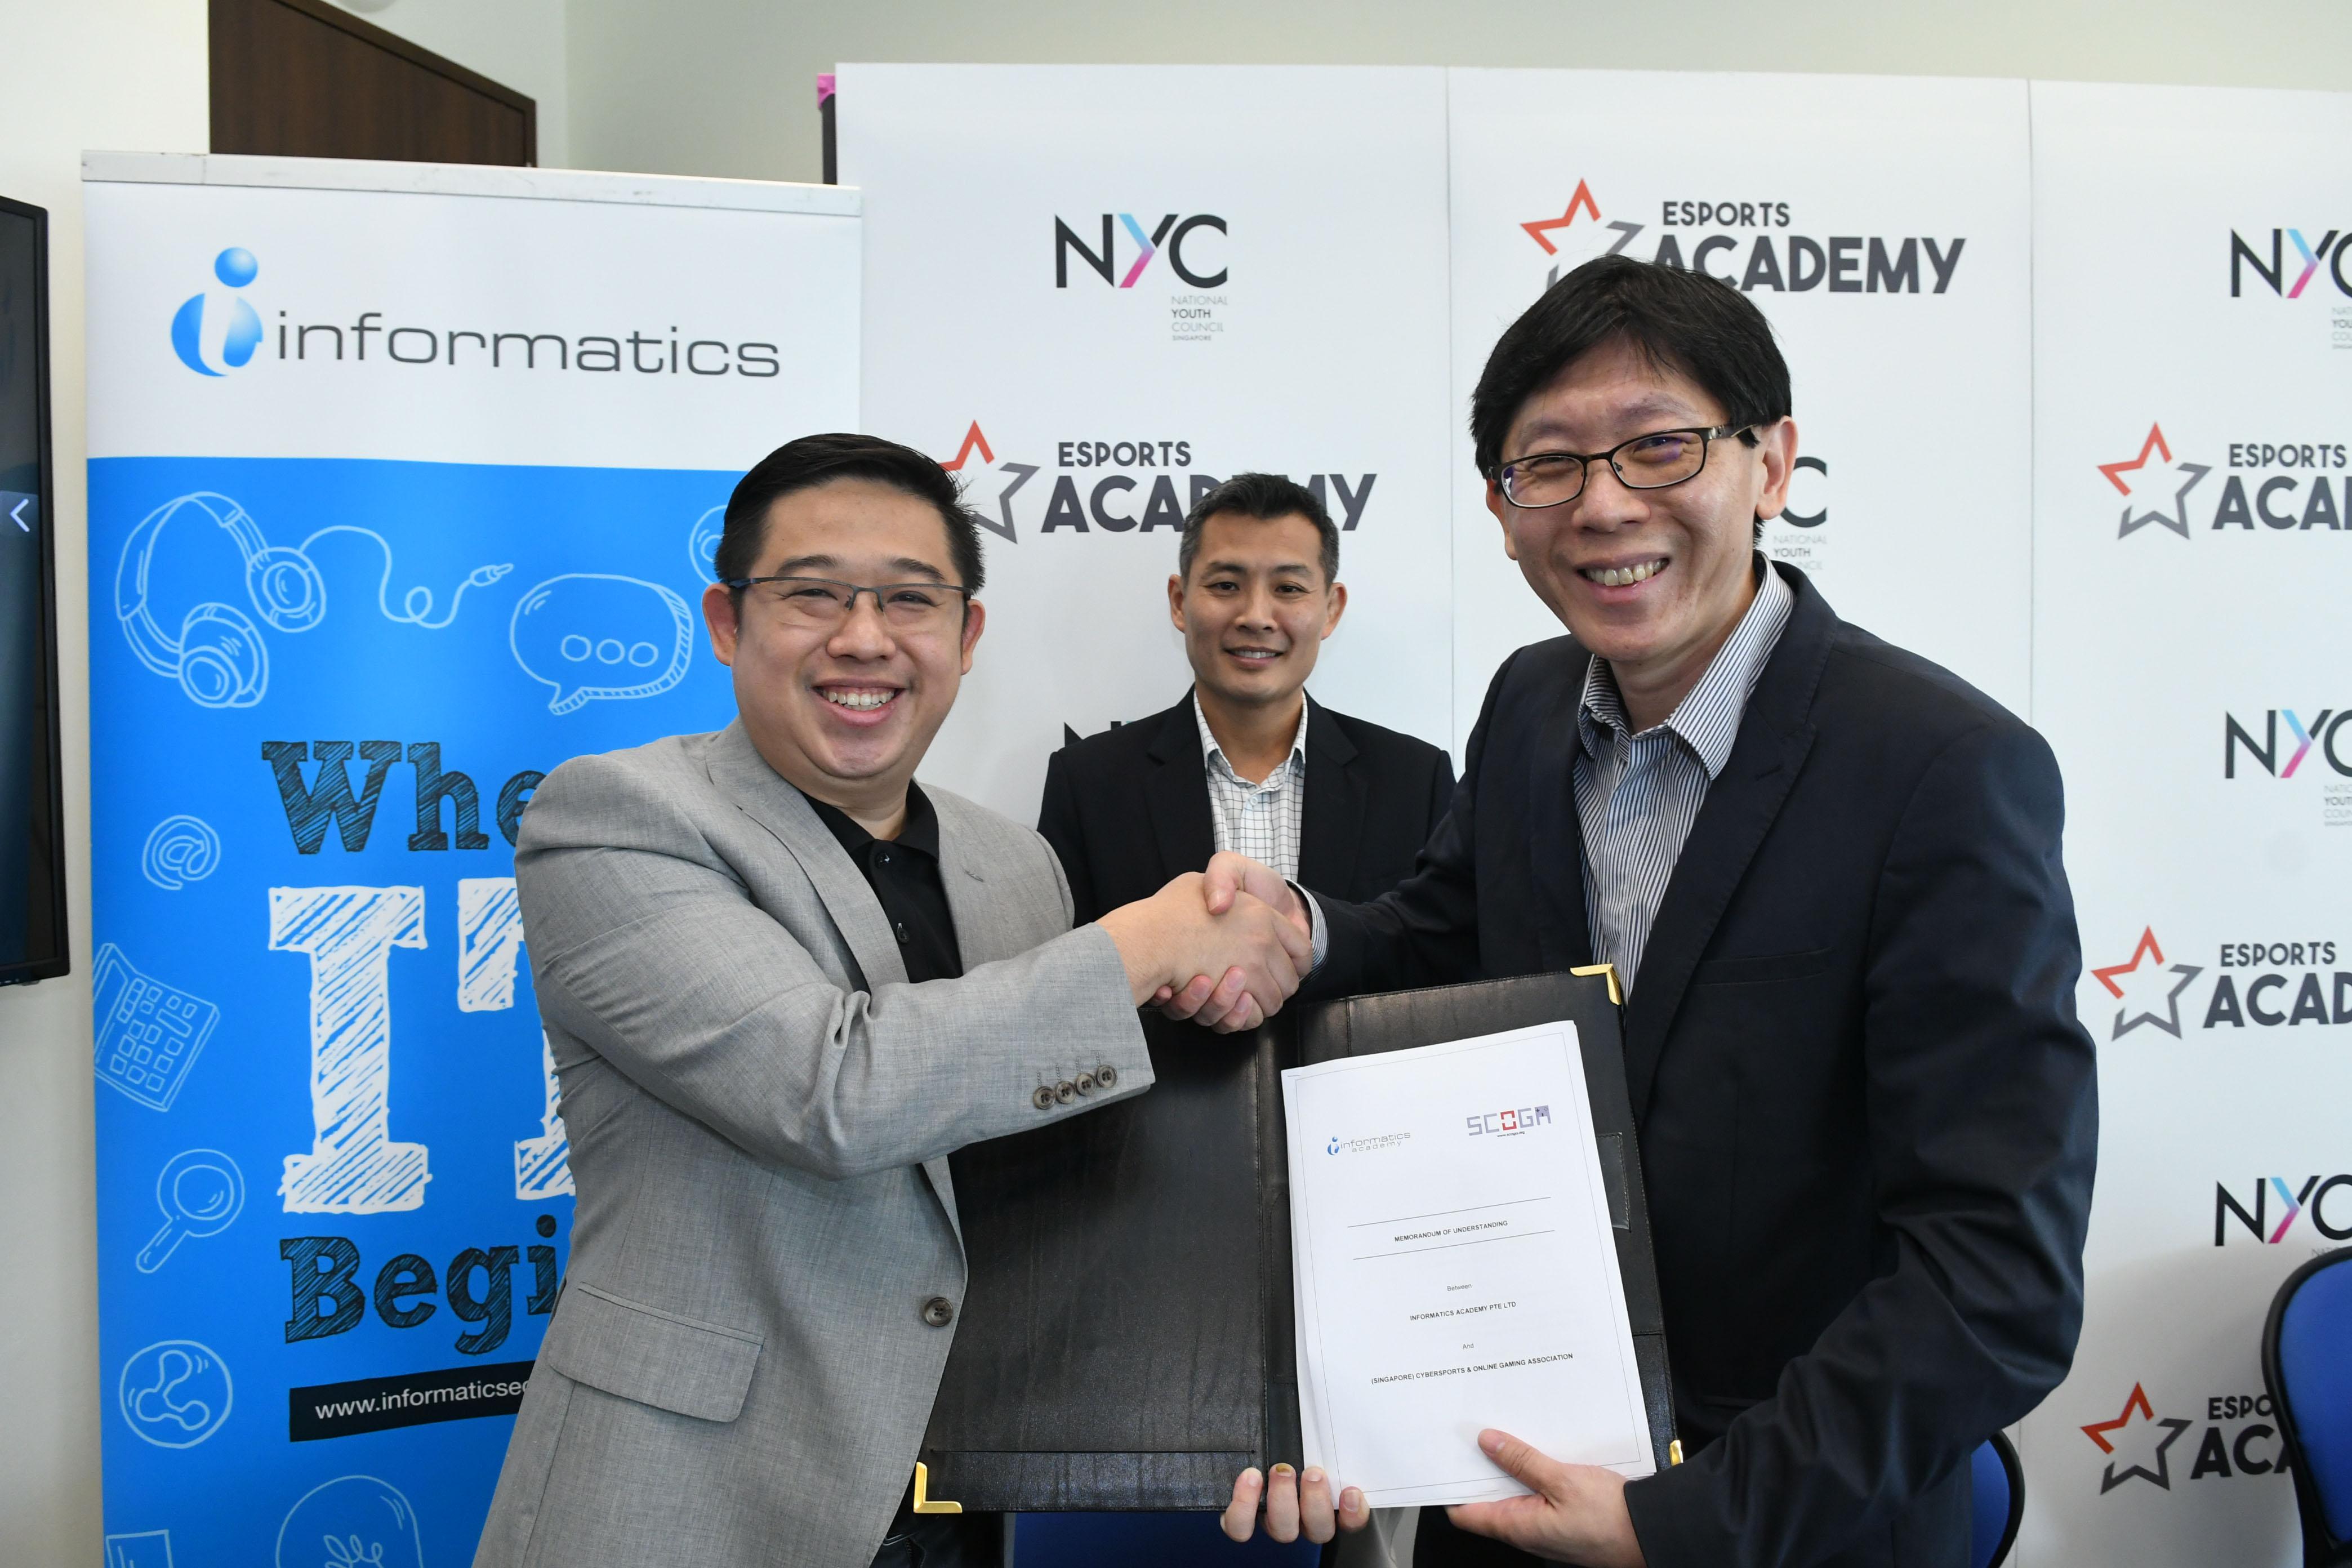 SINGAPORE – Mileage Breaks New Ground Publicising Esports